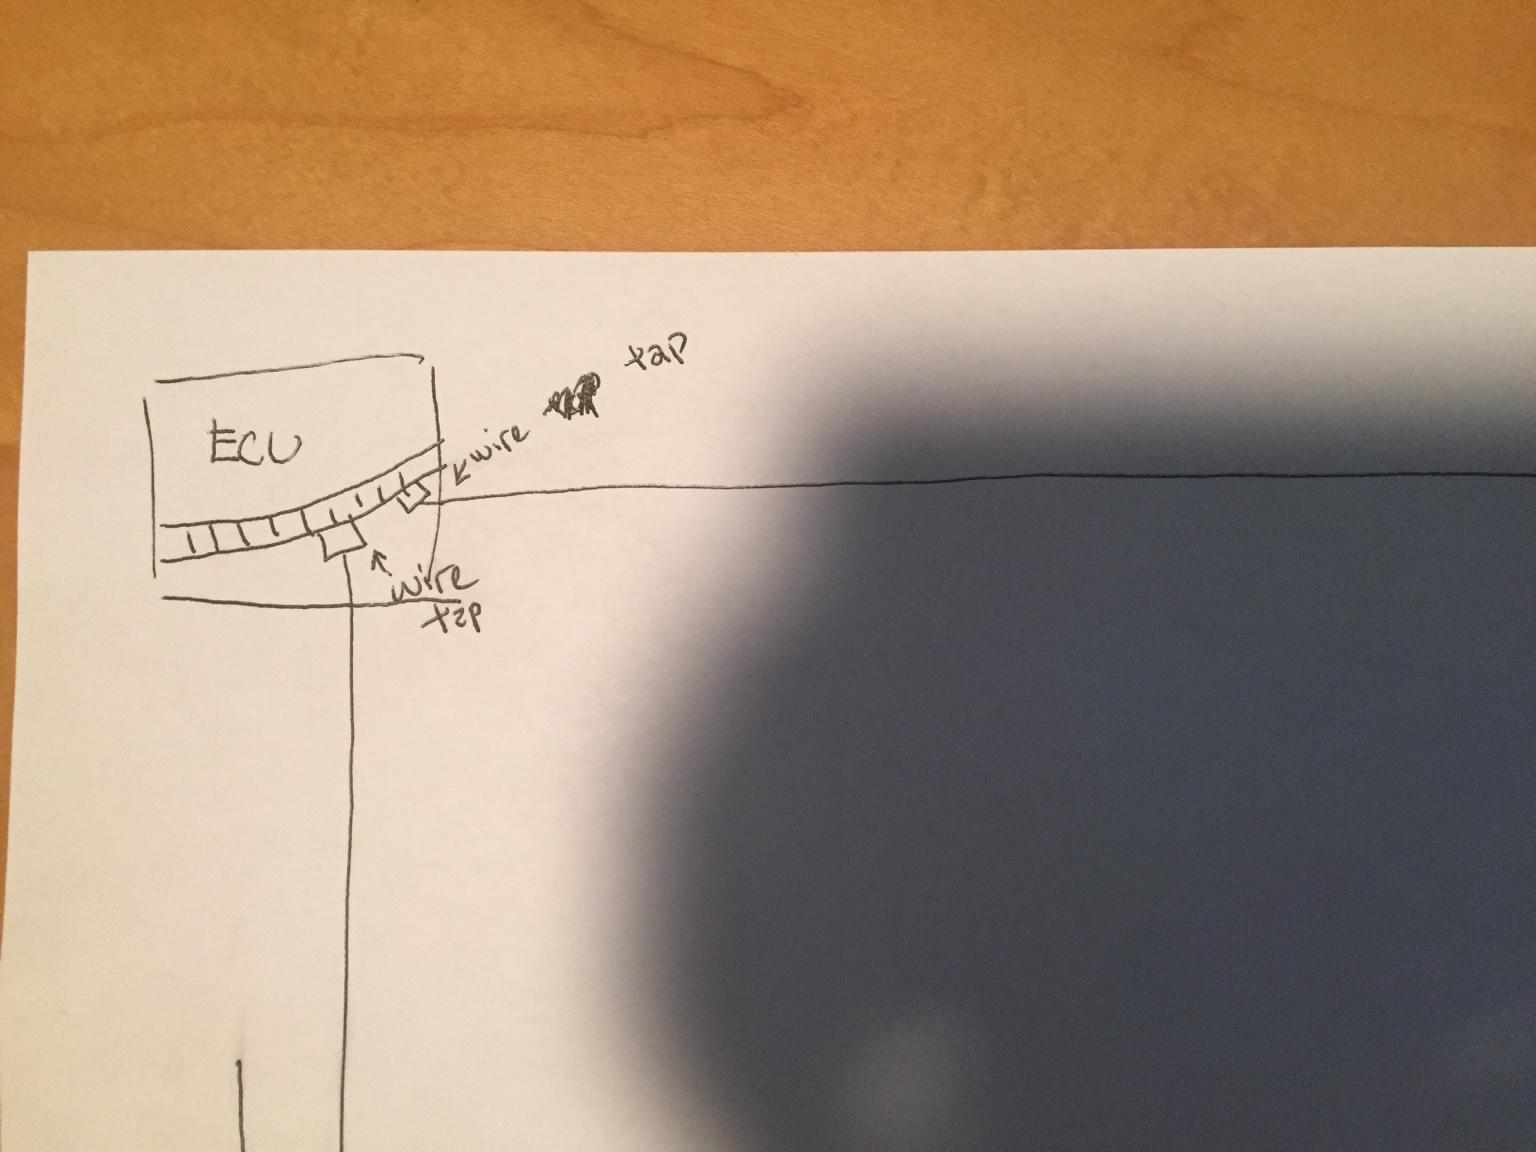 Bmw E60 Drl Wiring Diagram 26 Images Hyster Forklift Rh Bimmerforums Com 66ecc8e93bf32c50975dc17ba53b576b E39 Angel Eye